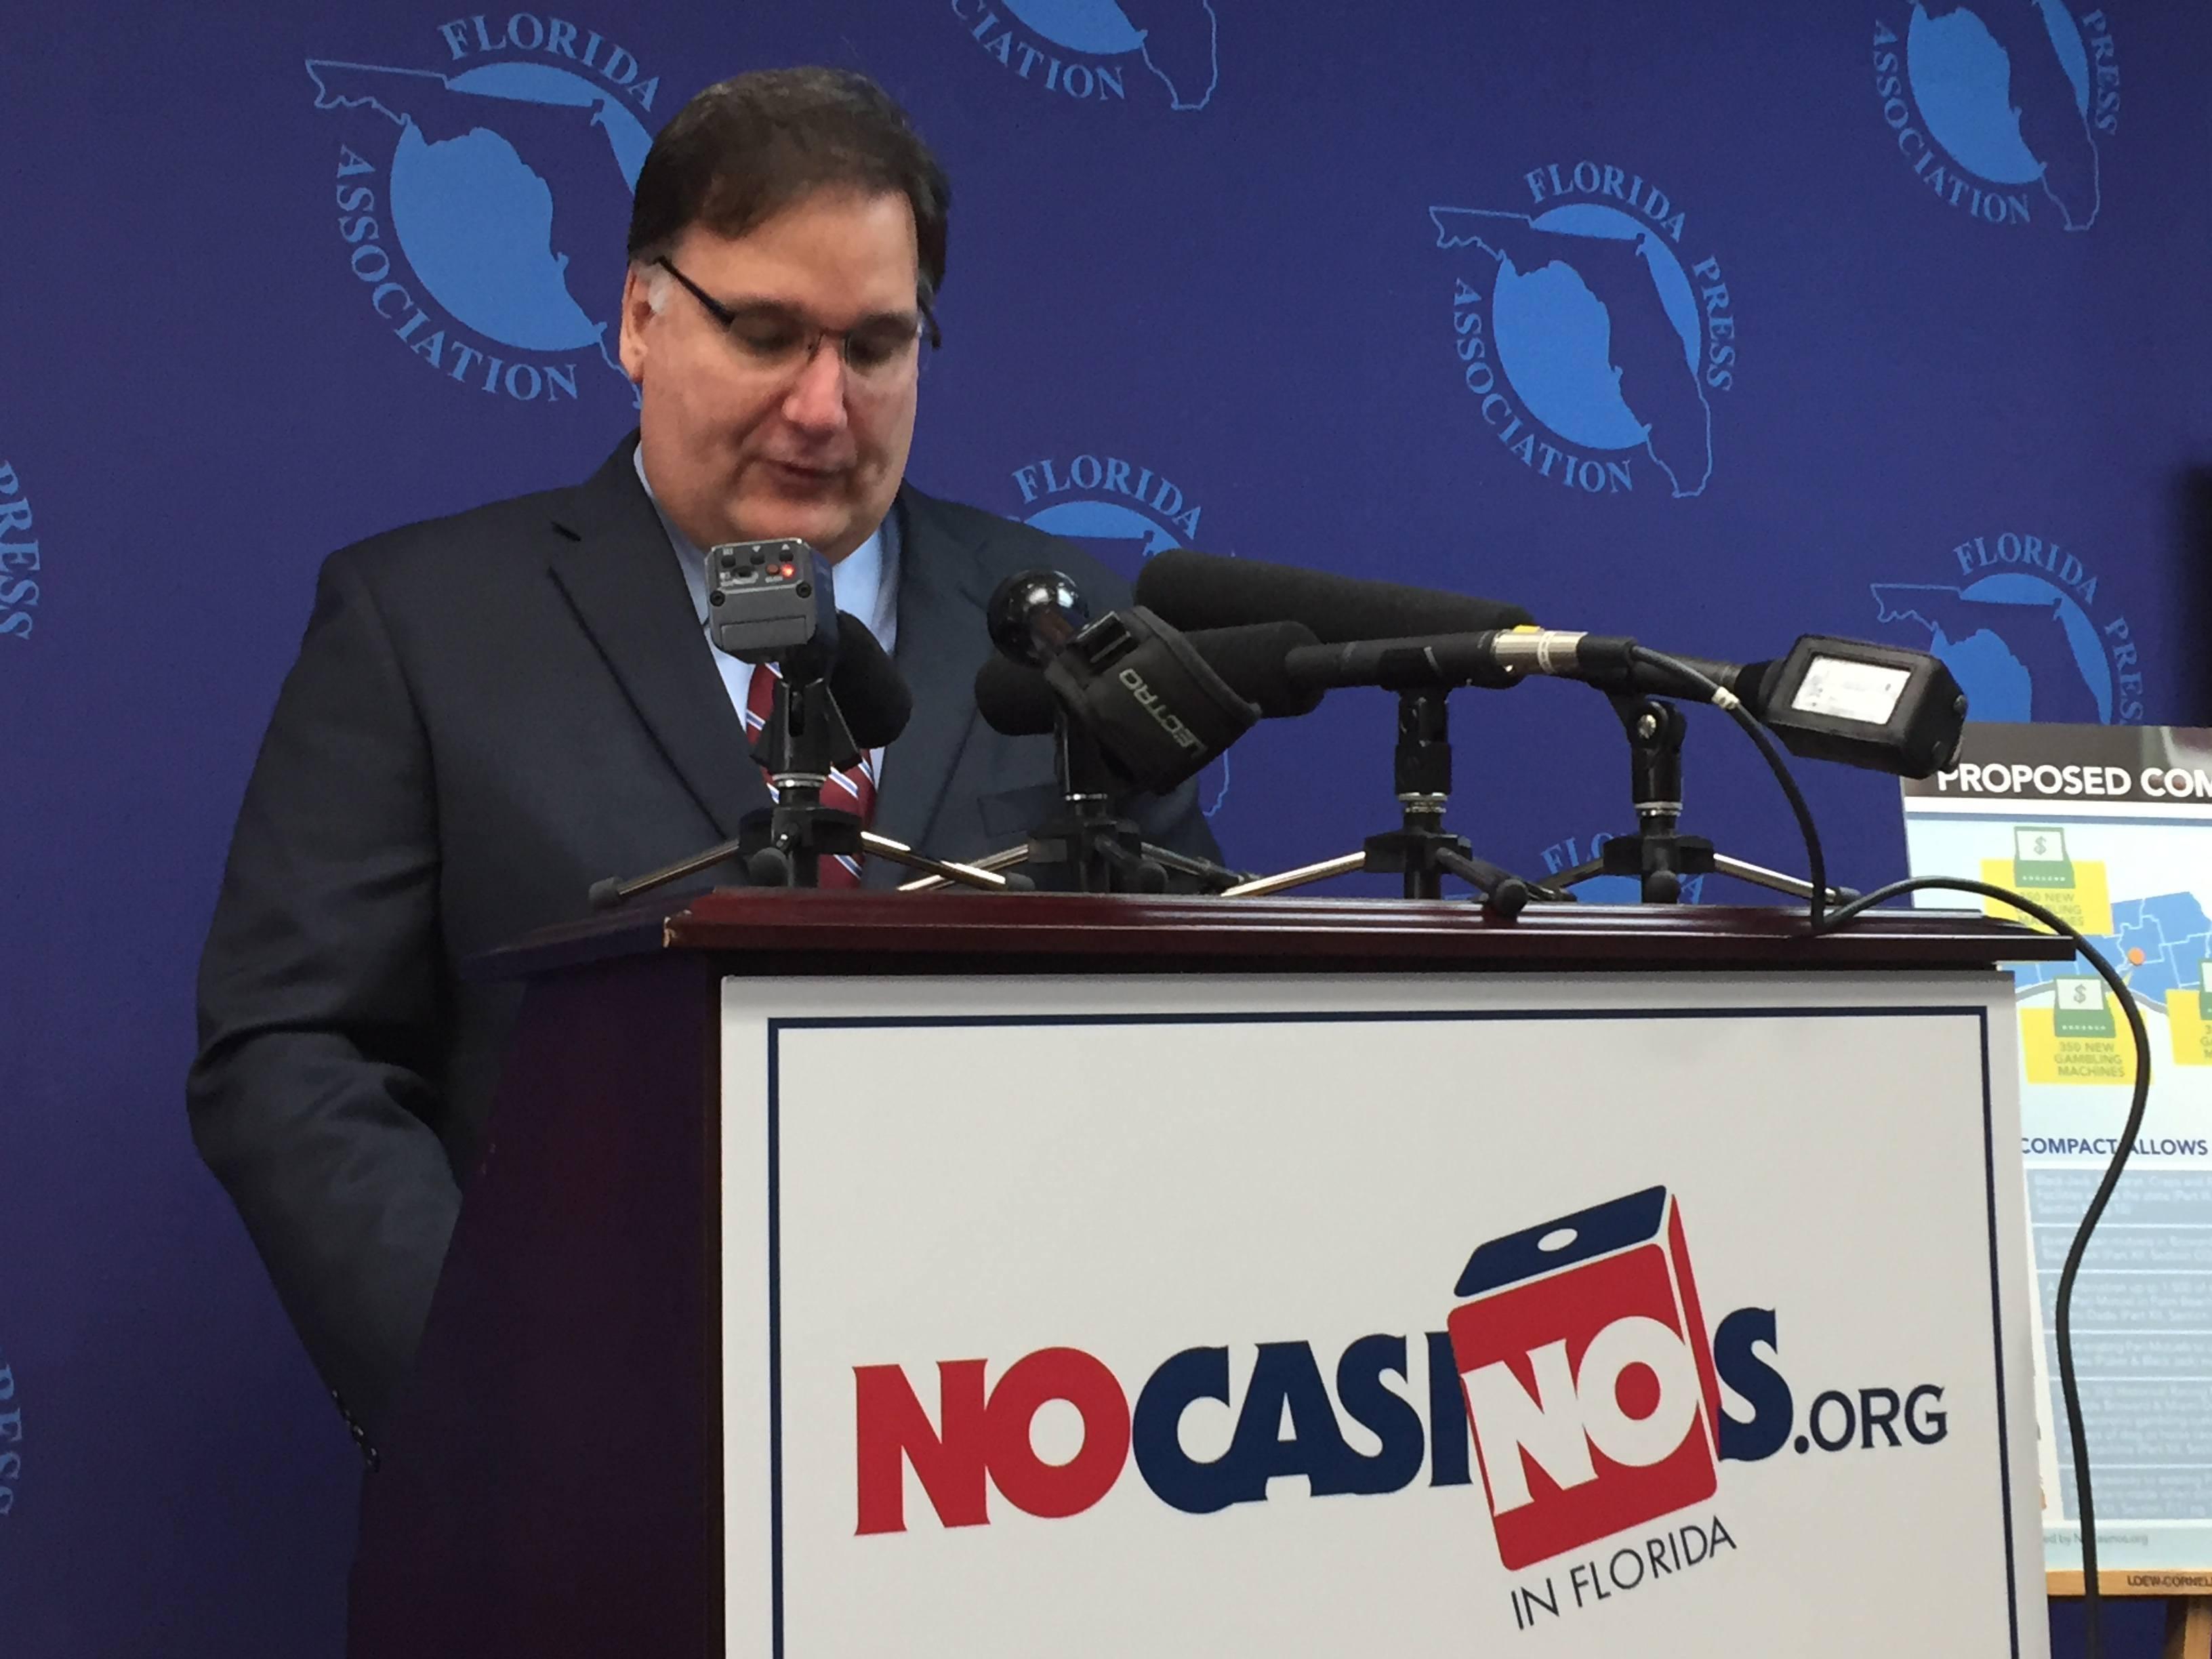 John Sowinski of NoCasinos